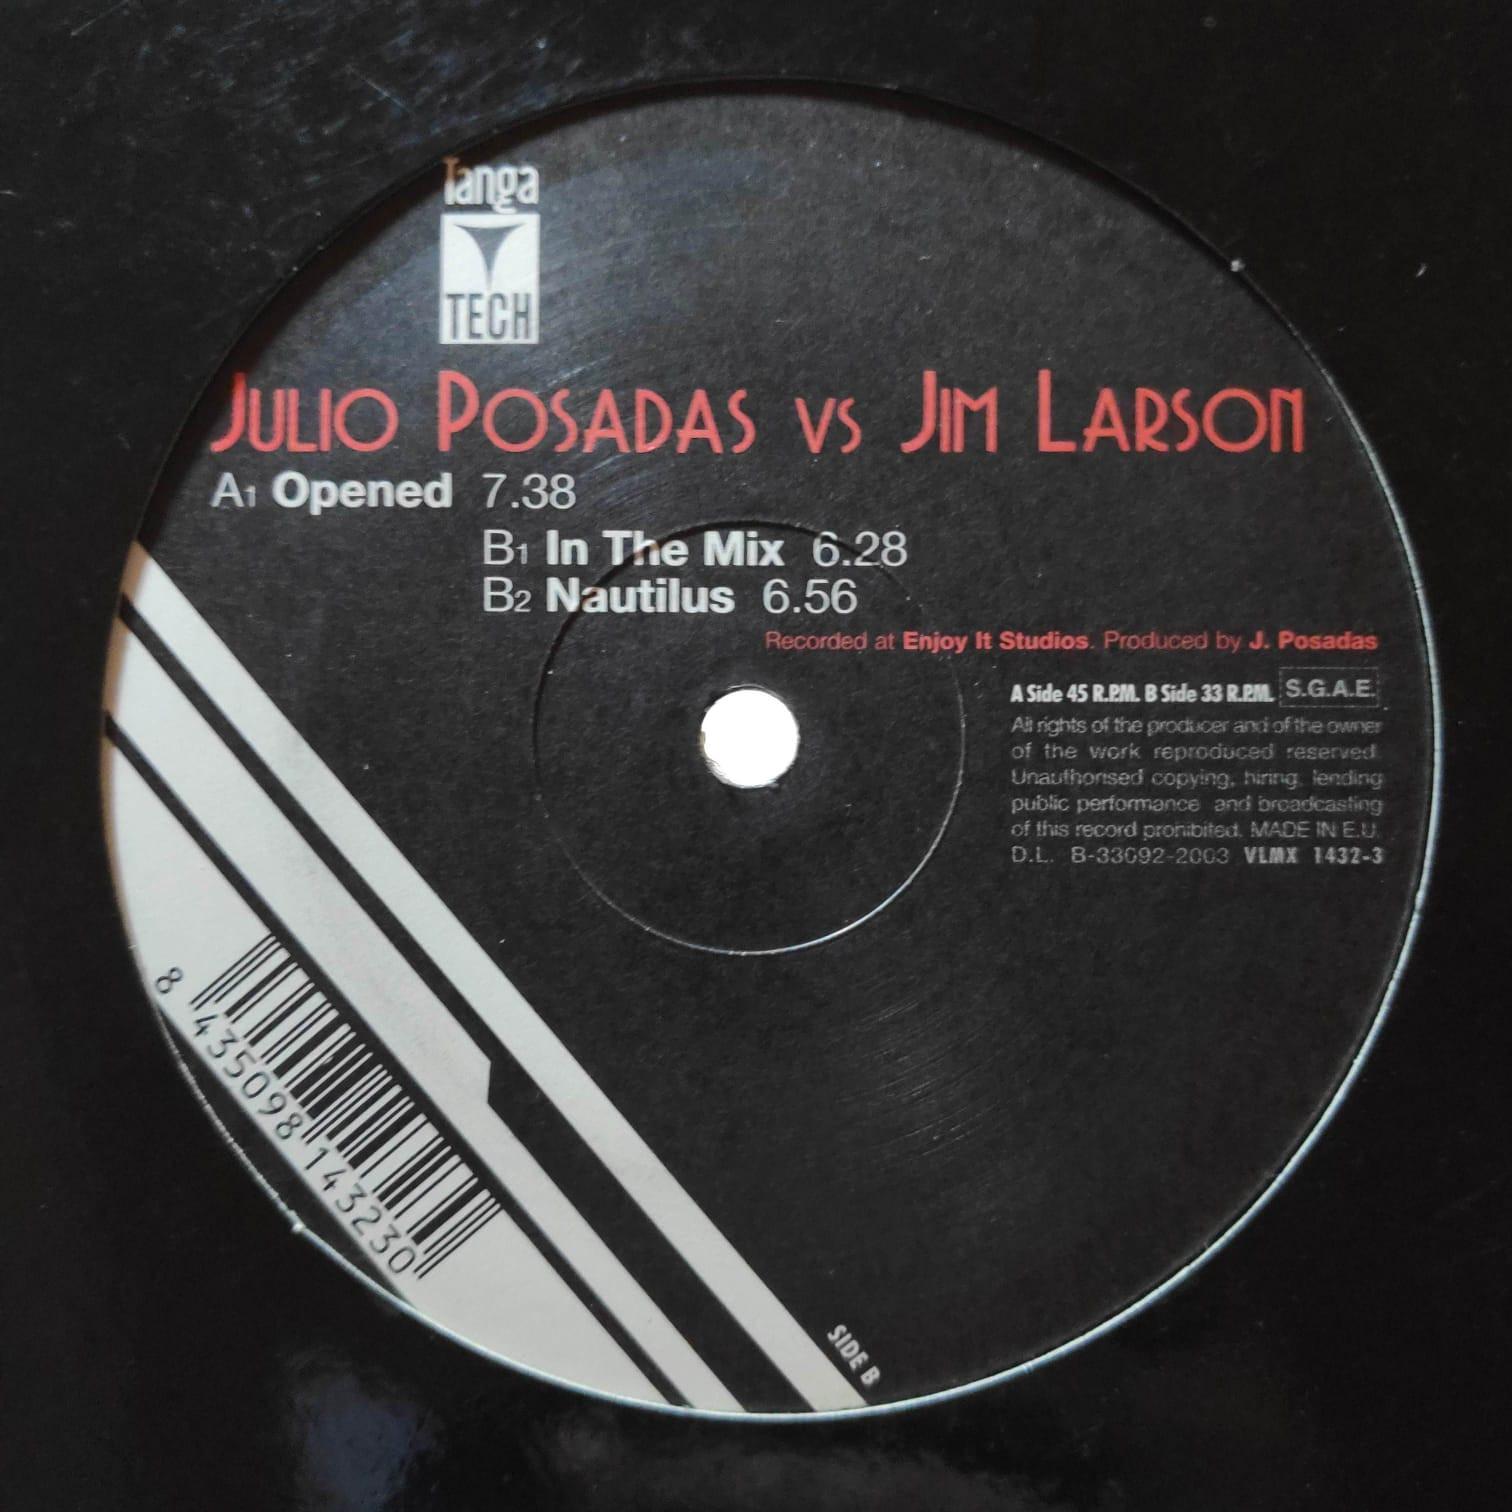 (29363) Julio Posadas Vs Jim Larson – Opened